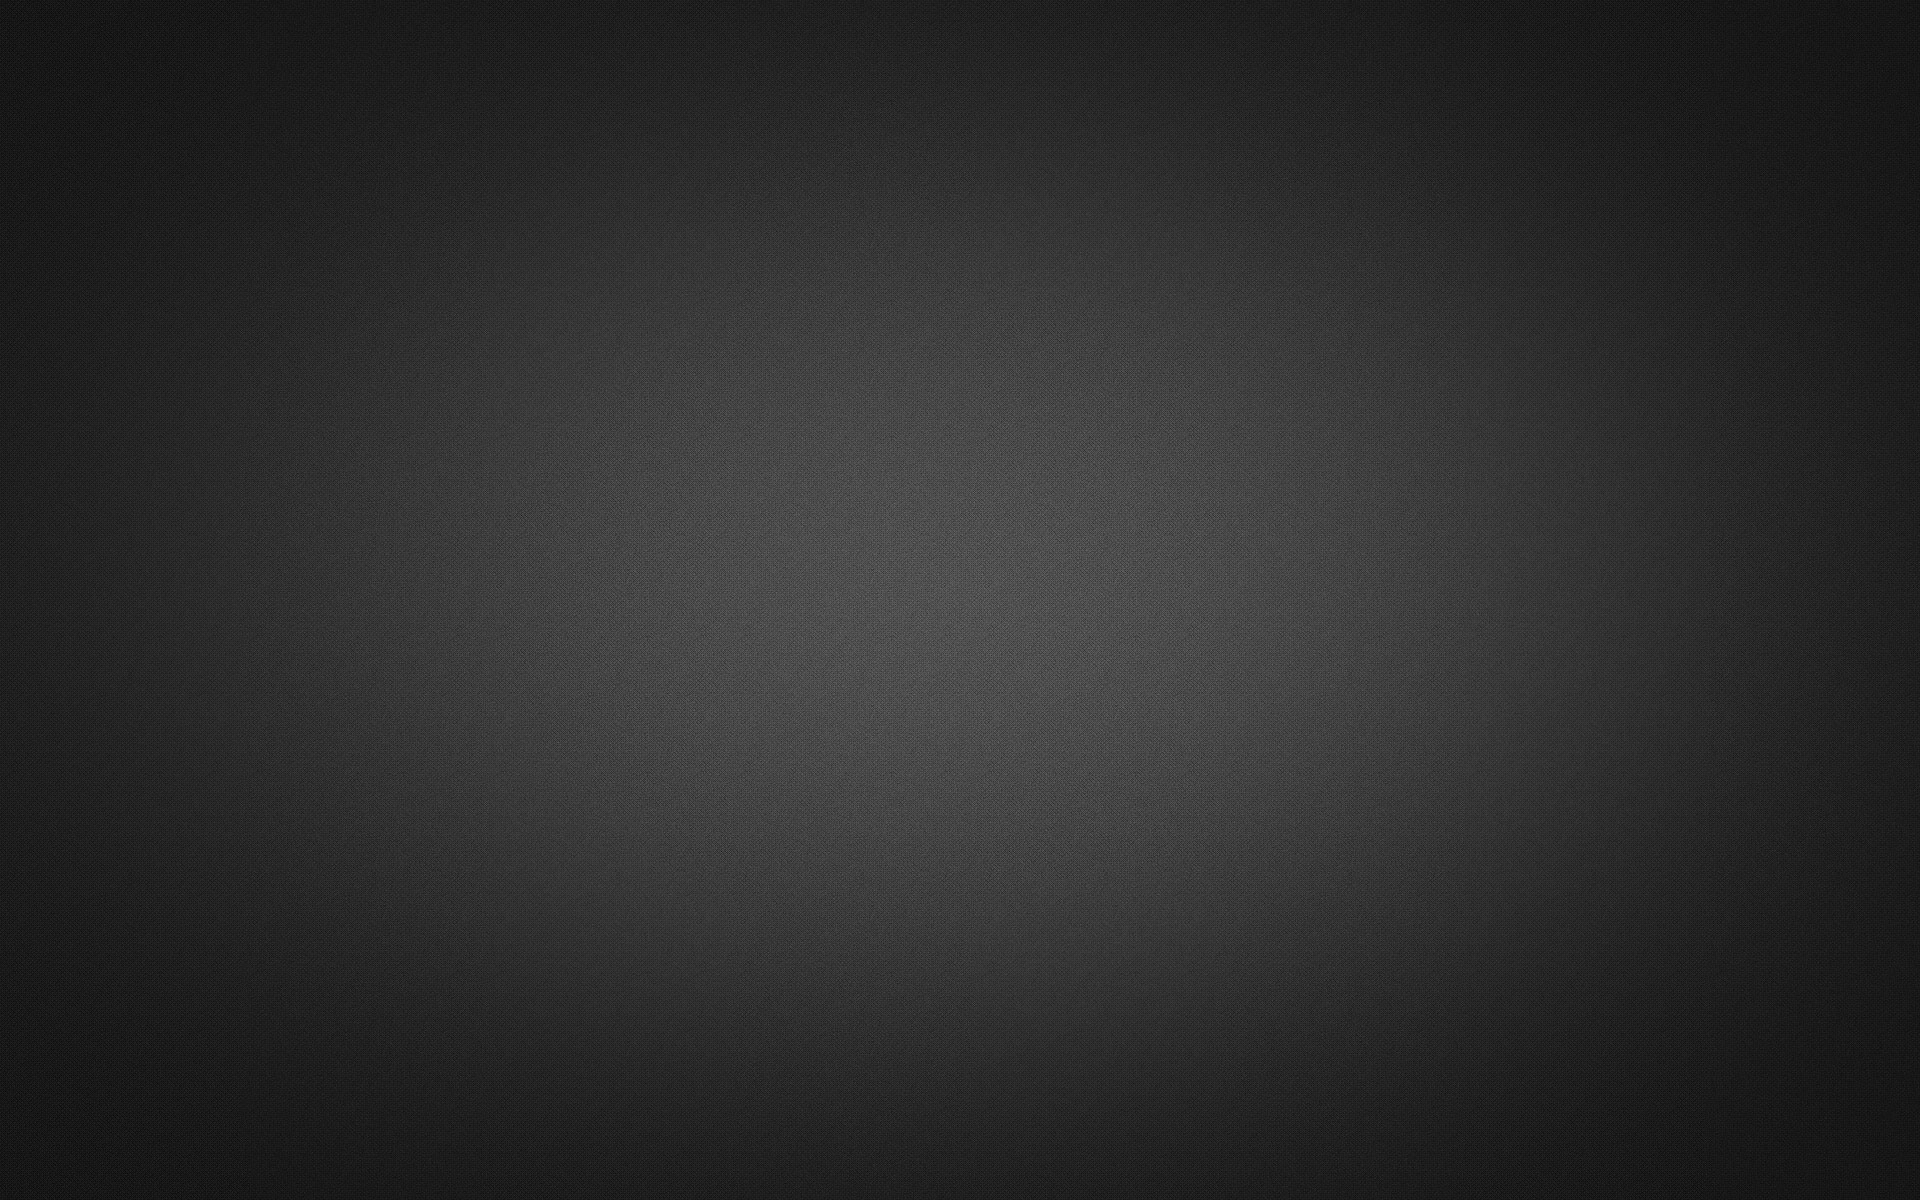 Background_Grey.jpg